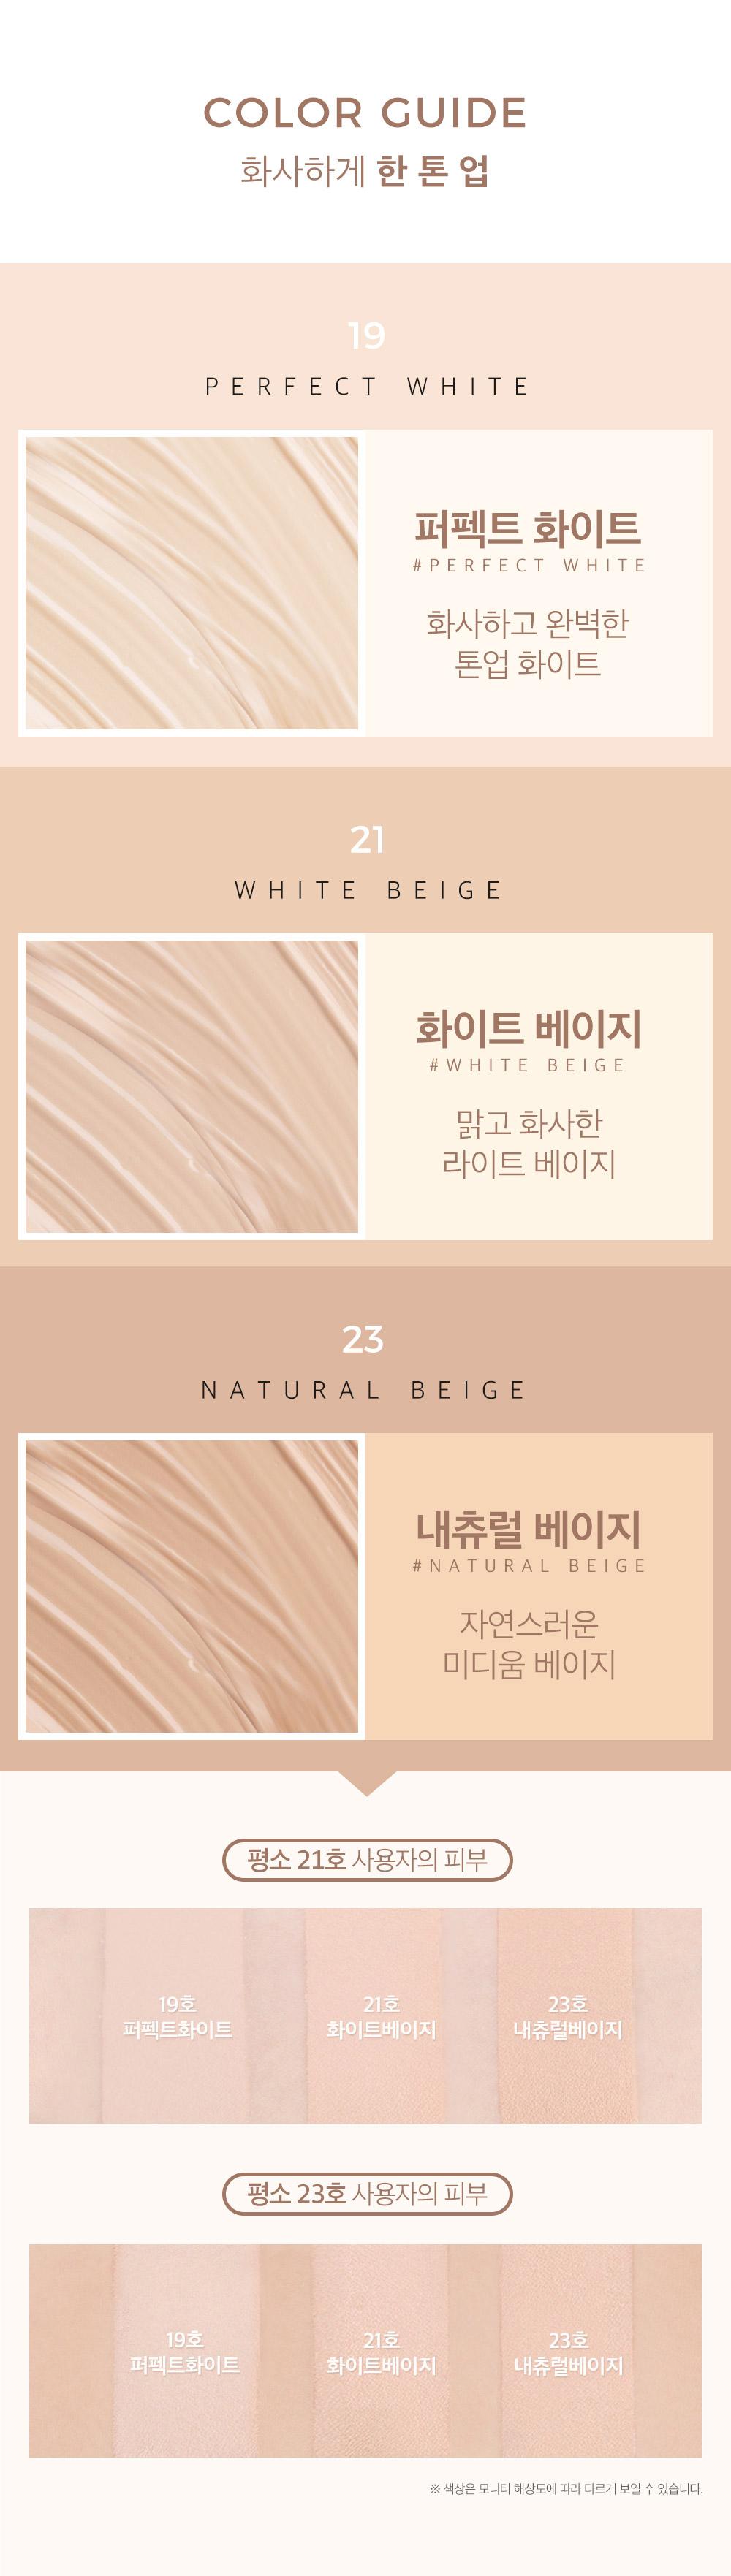 yeowoo-hwajangdae-snow-filter-cushion-15g-korean-cosmetic2.jpg